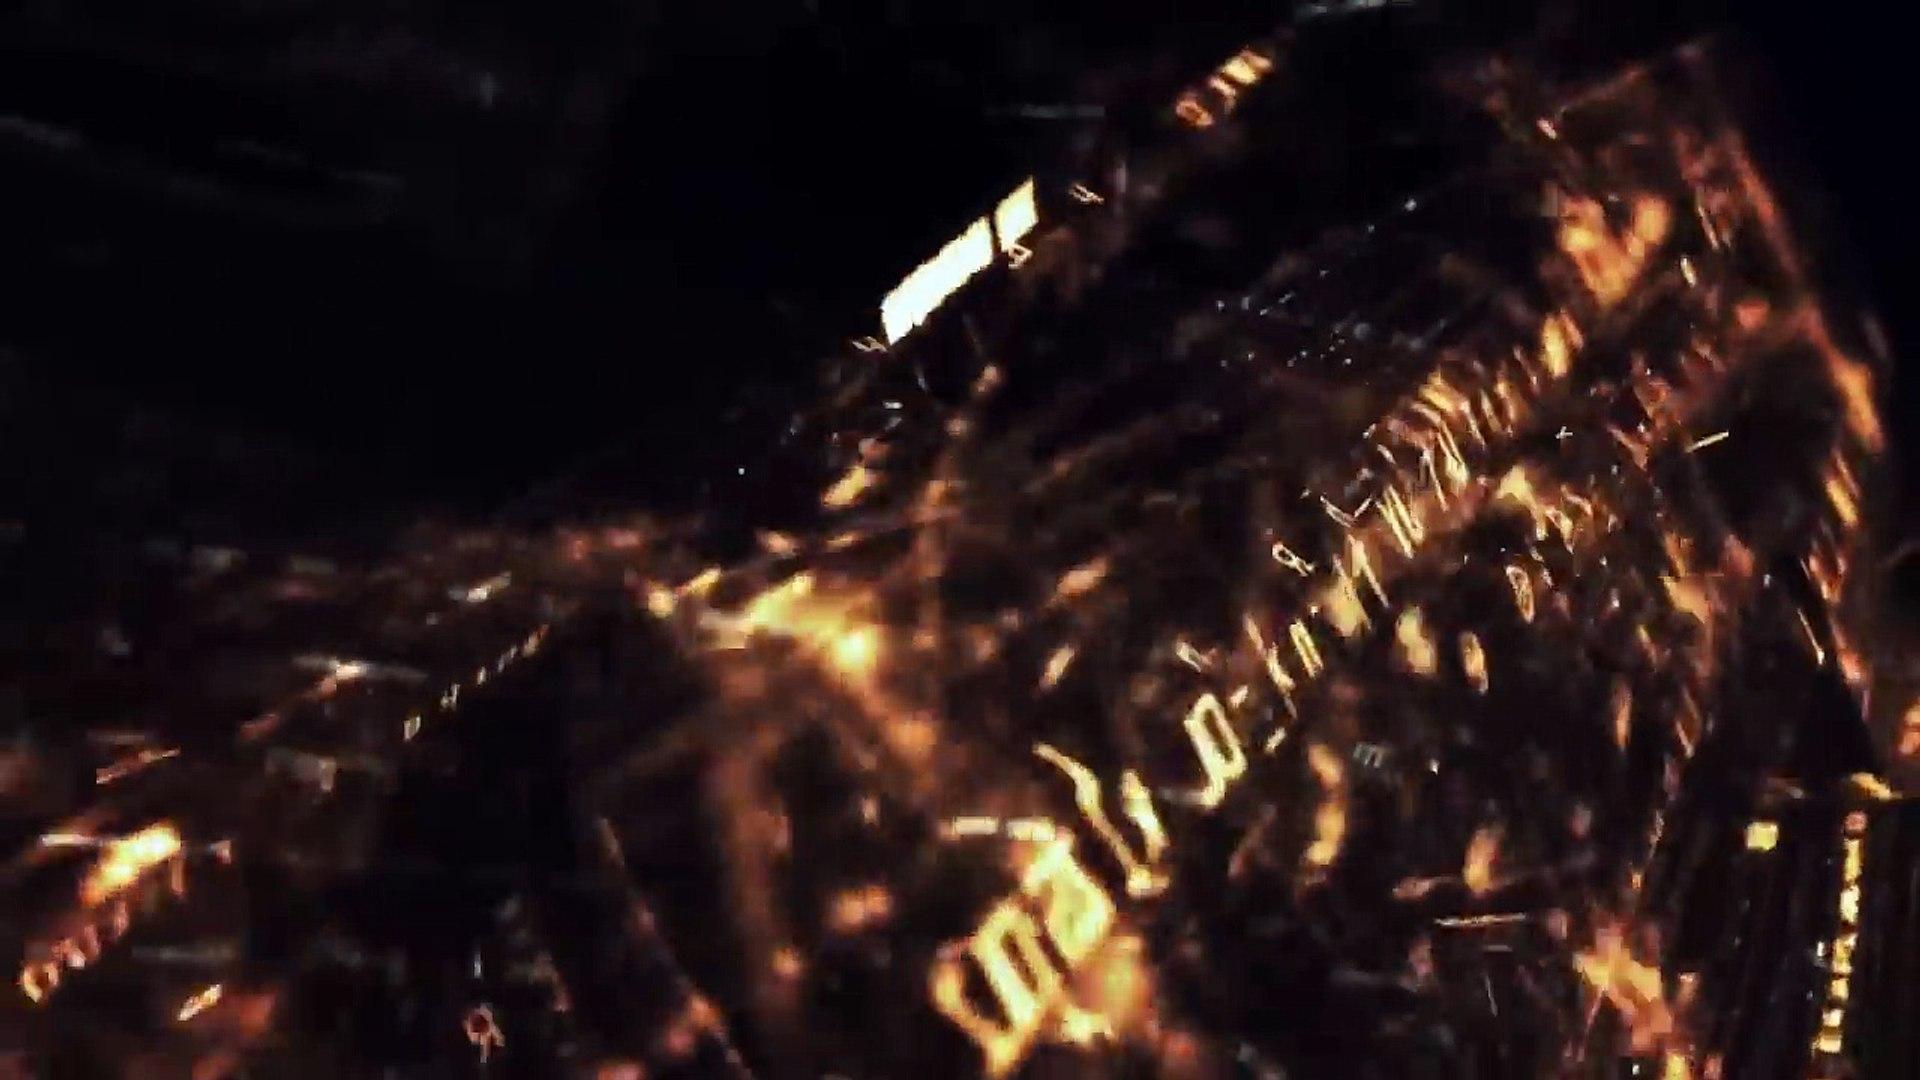 BLACK OPS 3 TRAILER! Official Call of Duty BO3 Trailer (COD BO3 Trailer)